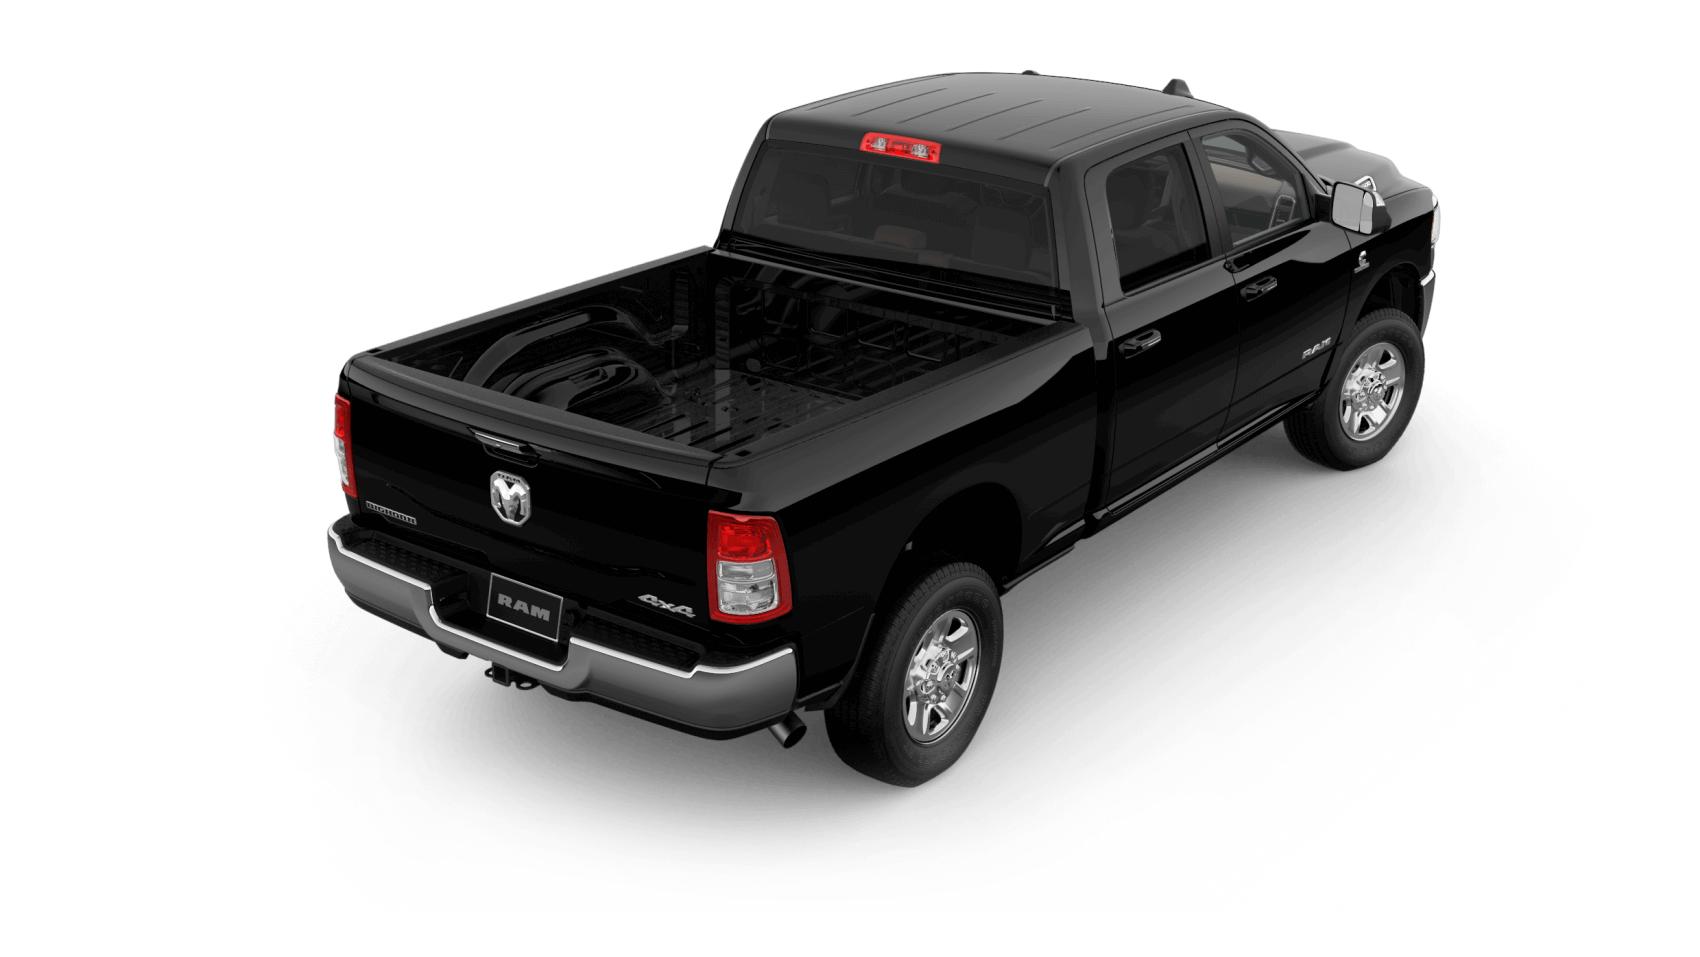 2021 Ram 2500 Big Horn Crew Cab Diamond Black Wilsonville CDJR